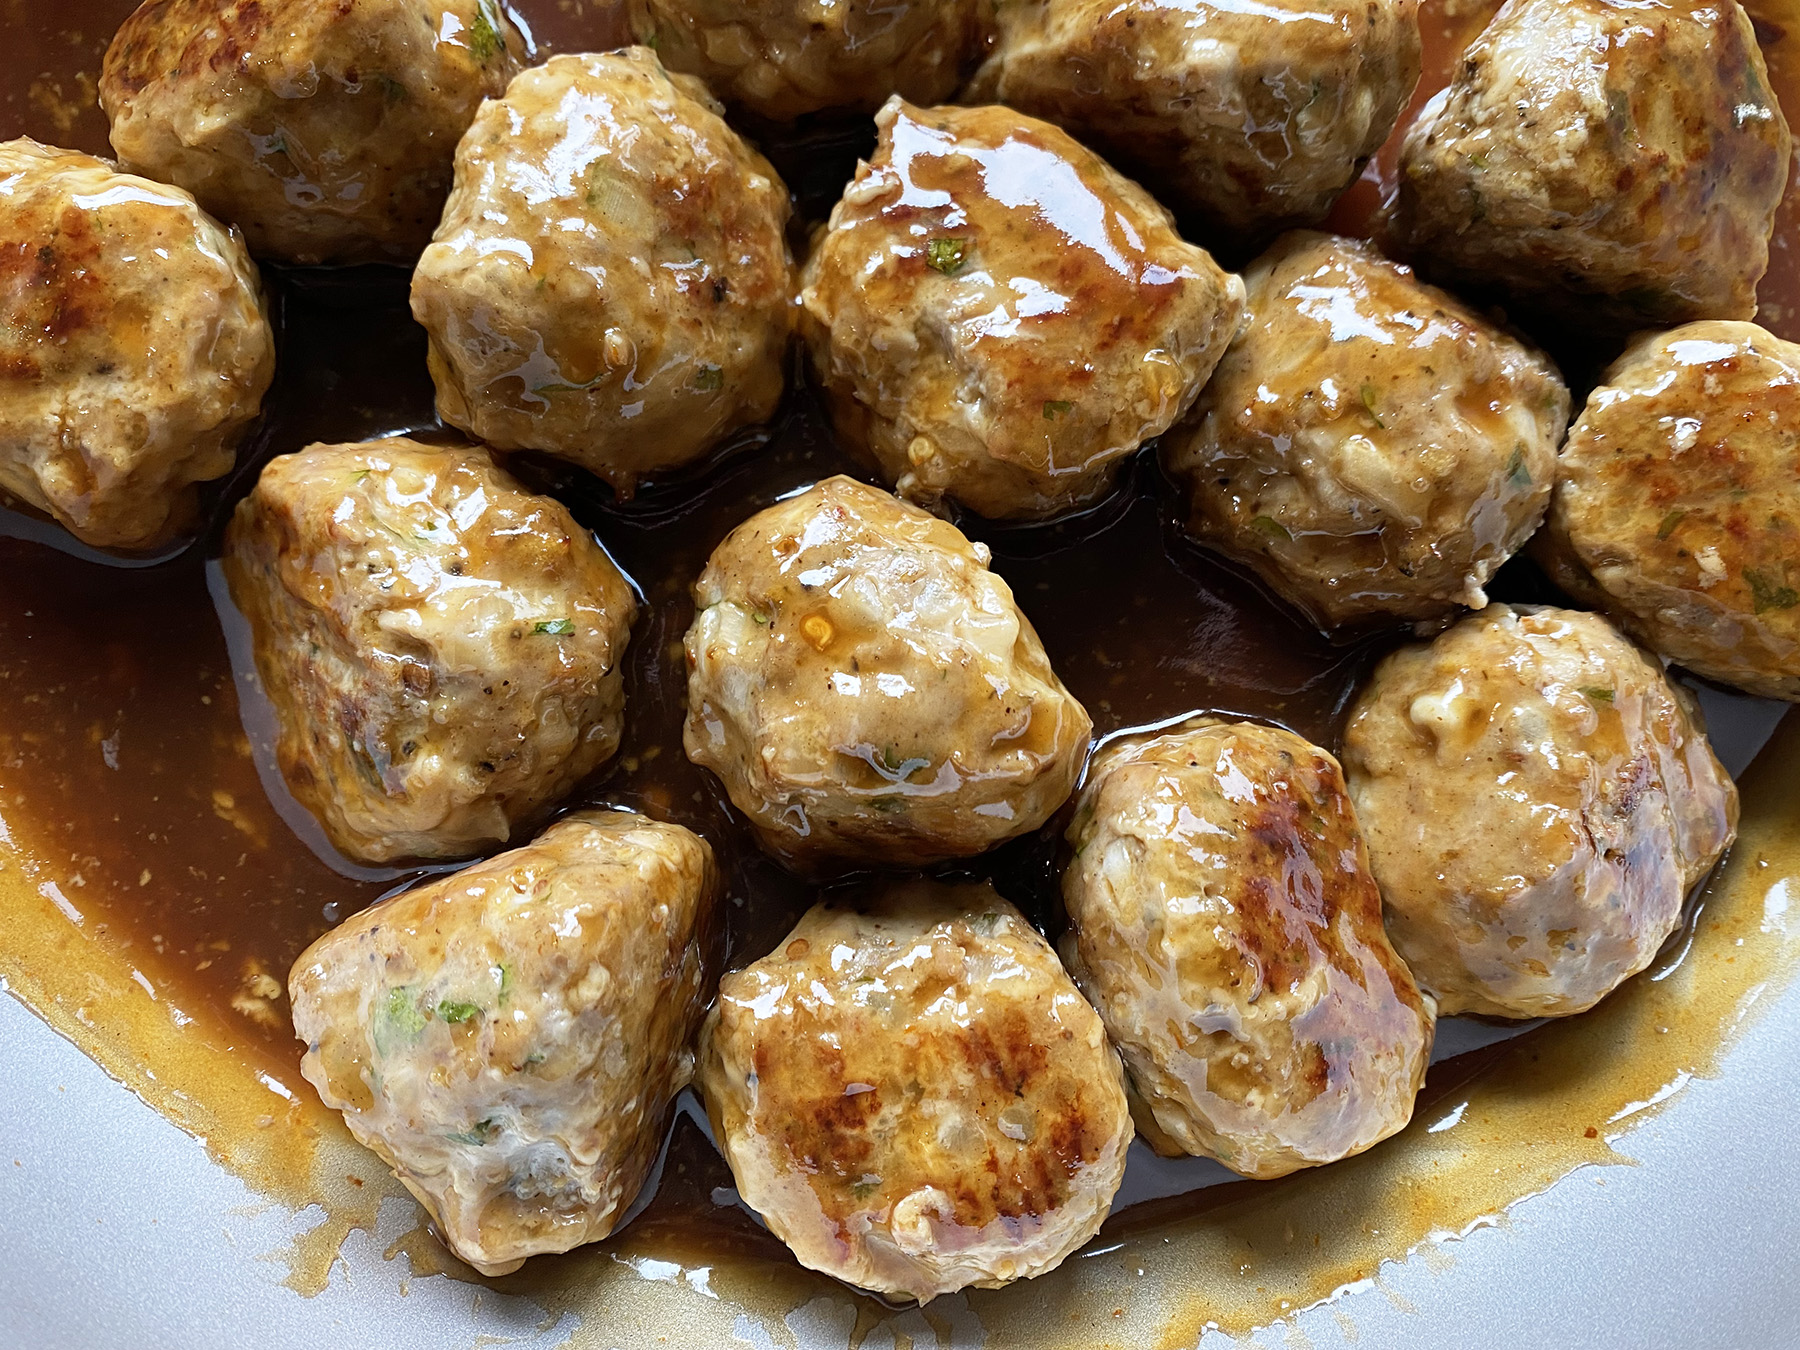 Jerk Chicken Meatballs (with Barbecue Pineapple Glaze)